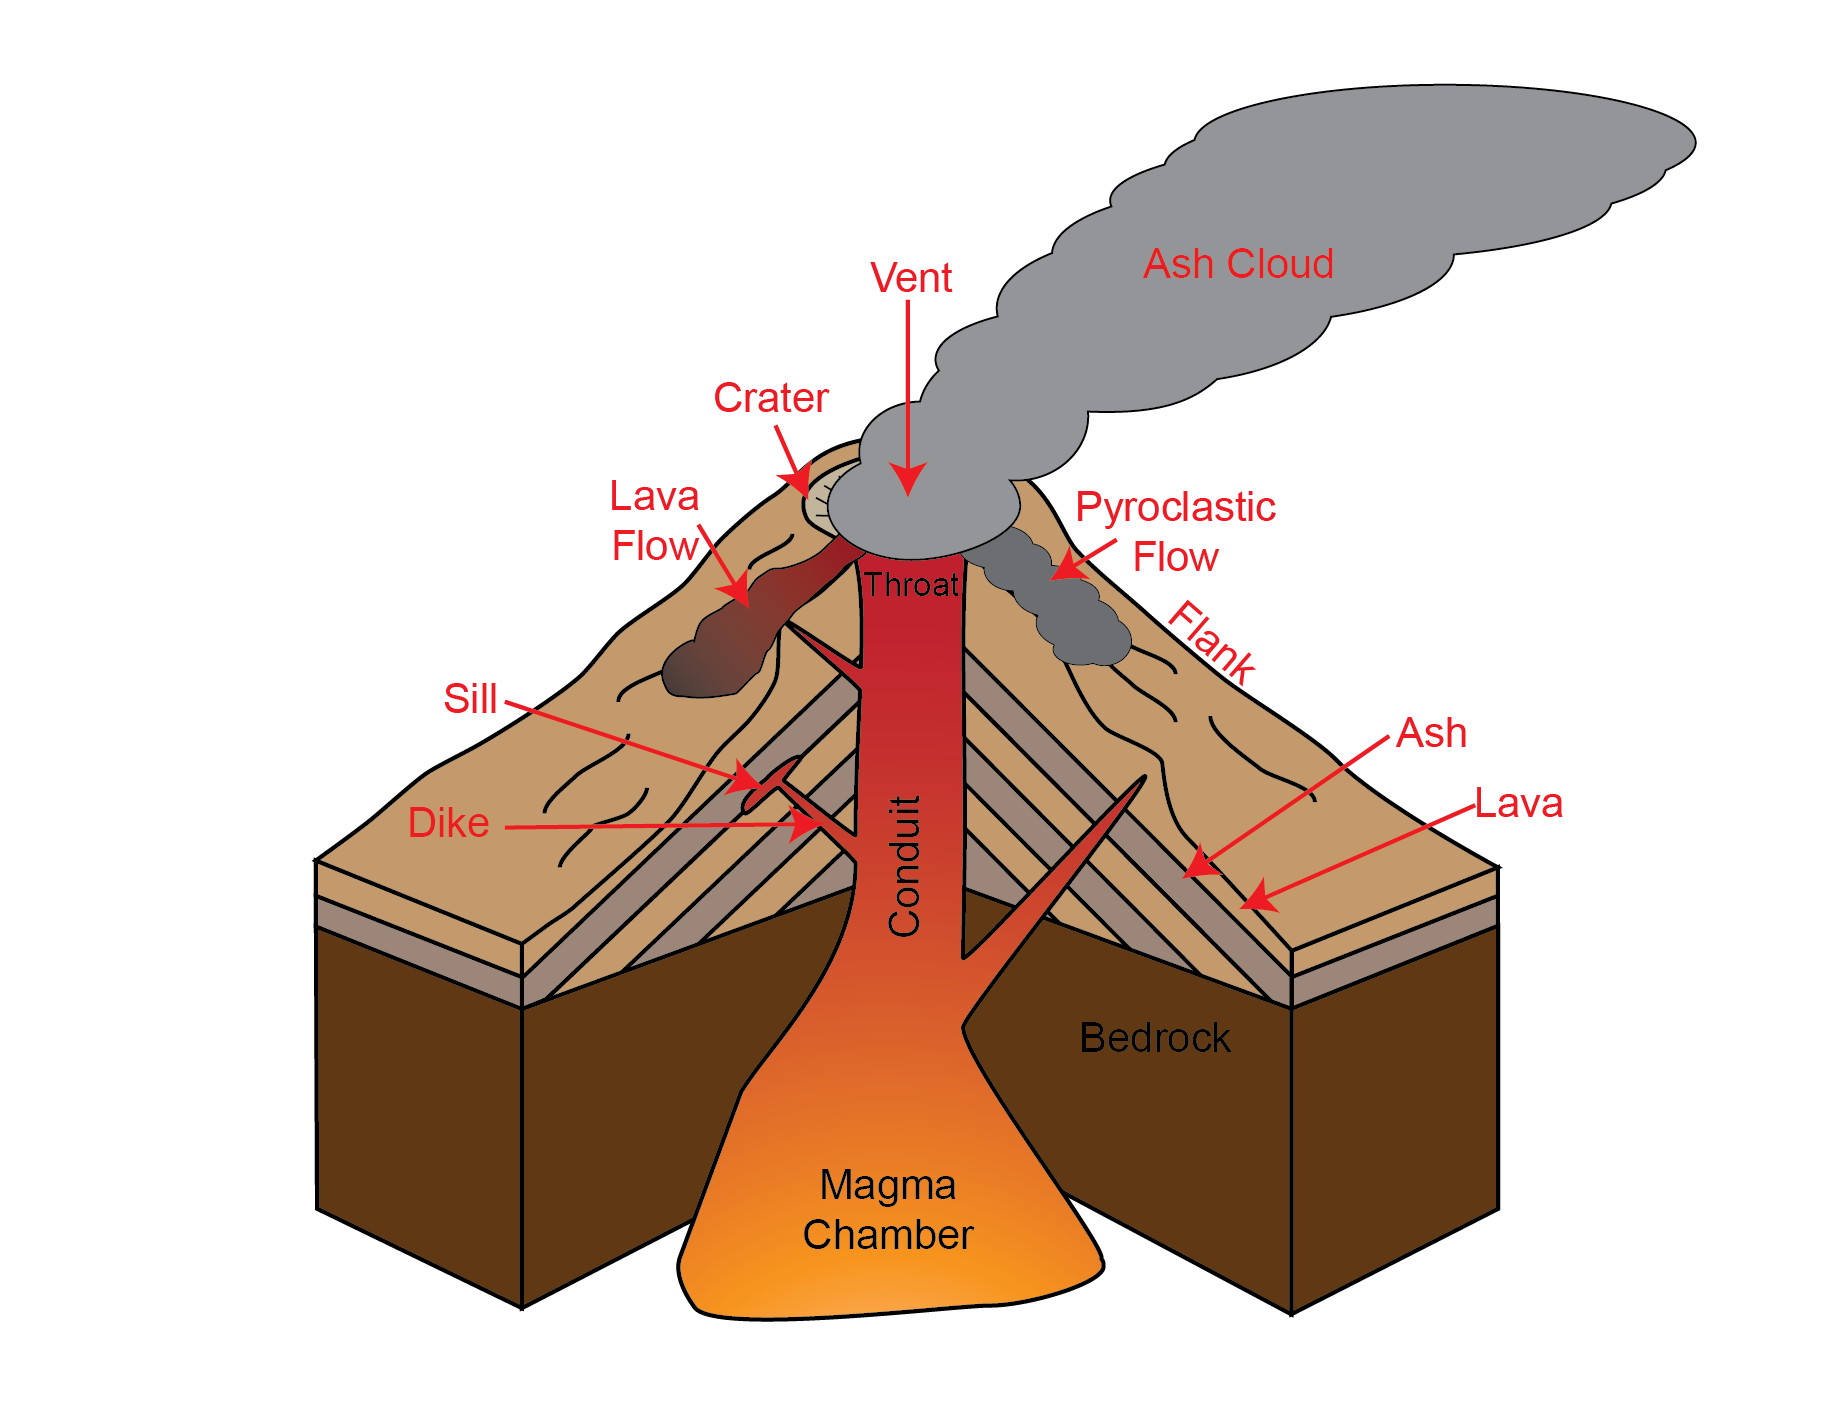 Inside Labelled Diagram Volcano Diagram - Aflam-Neeeak